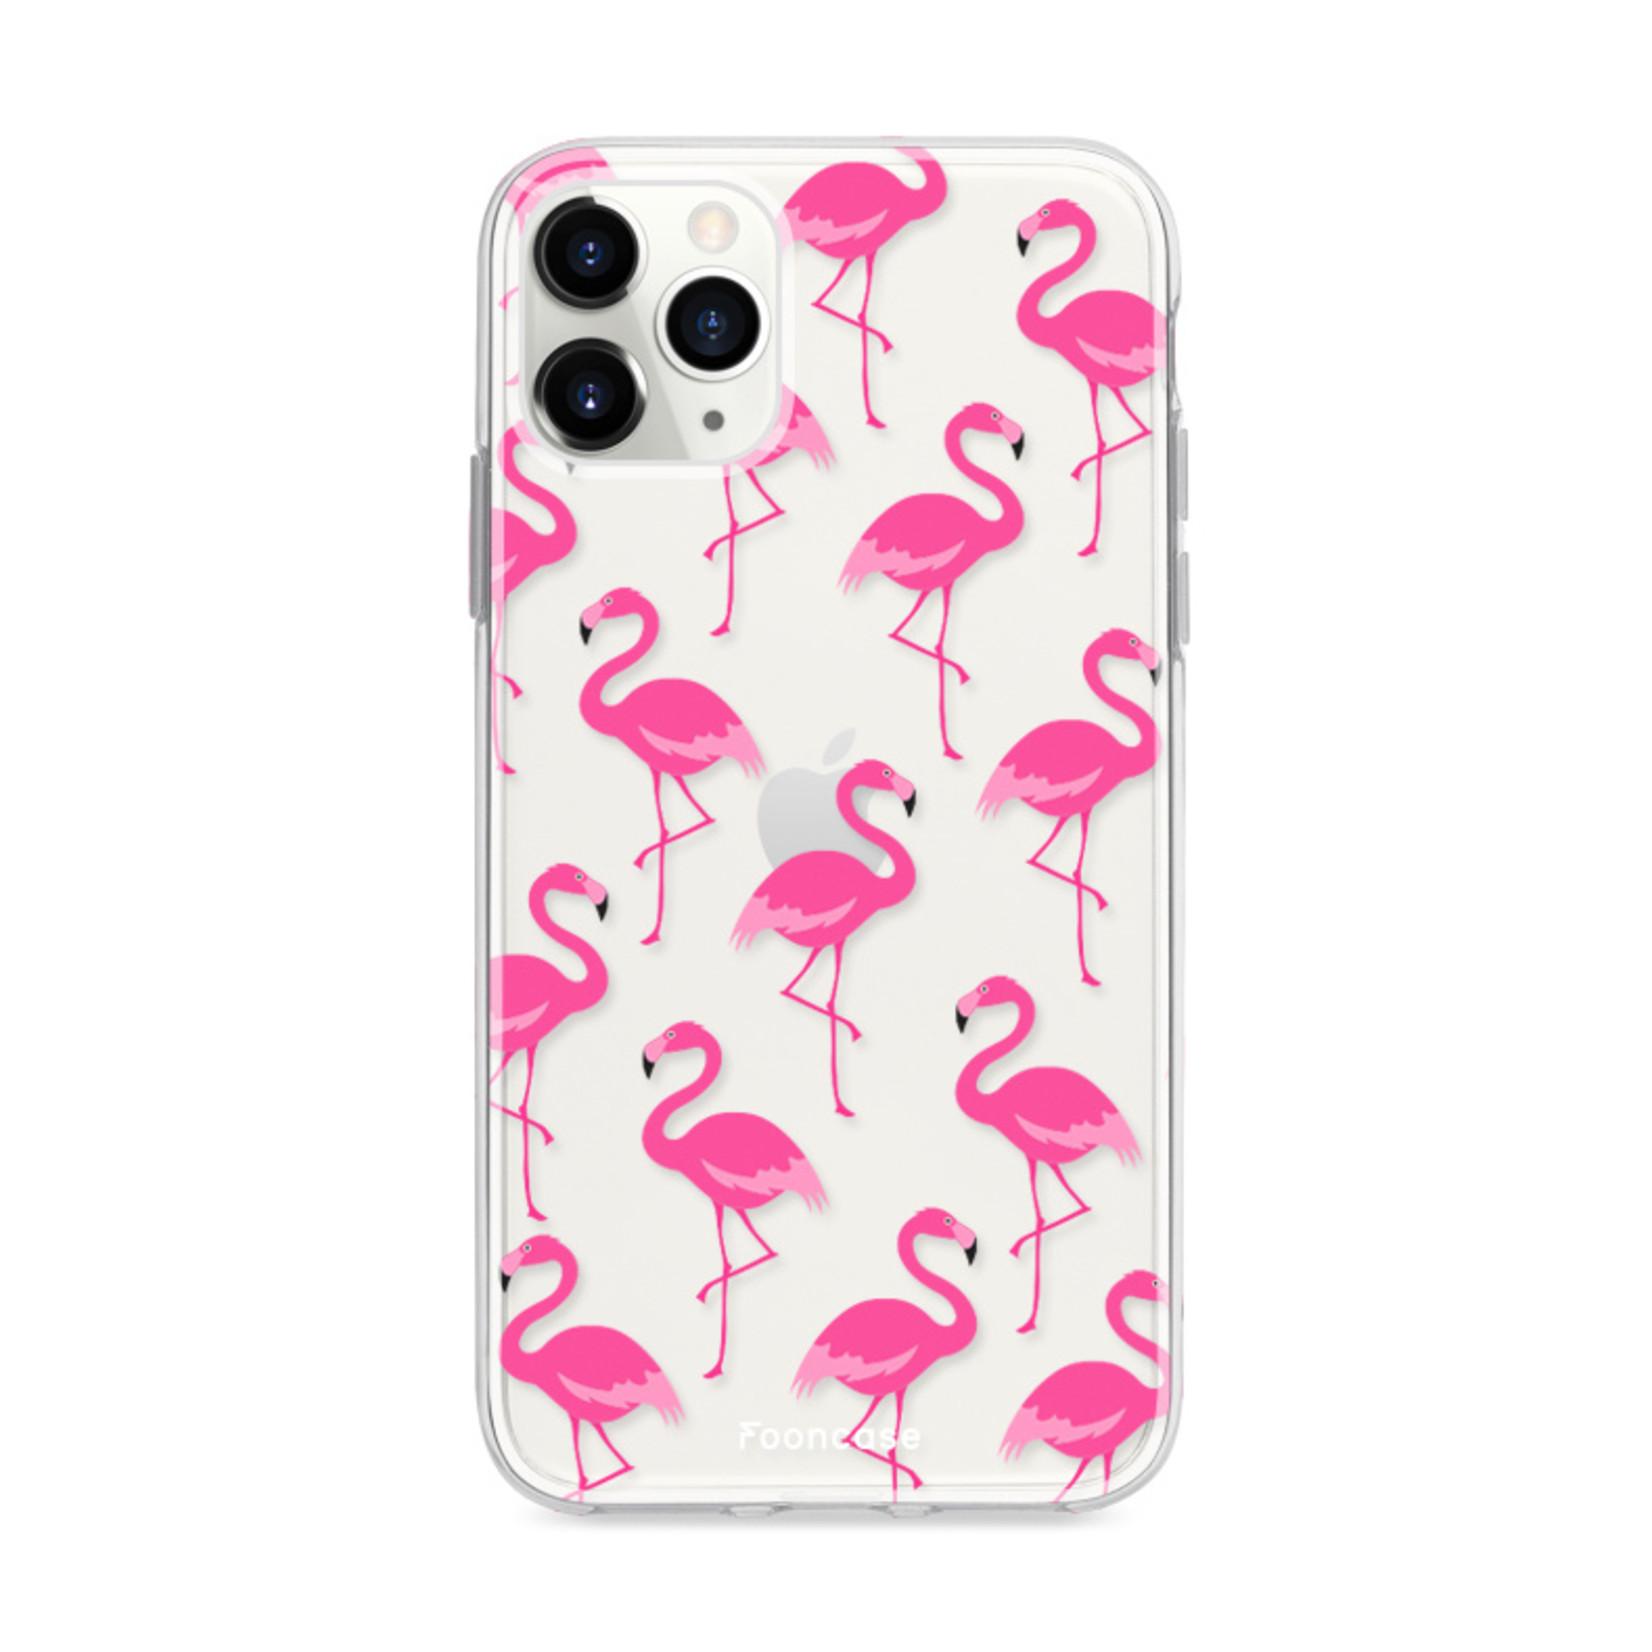 FOONCASE IPhone 11 Pro Max Handyhülle - Flamingo